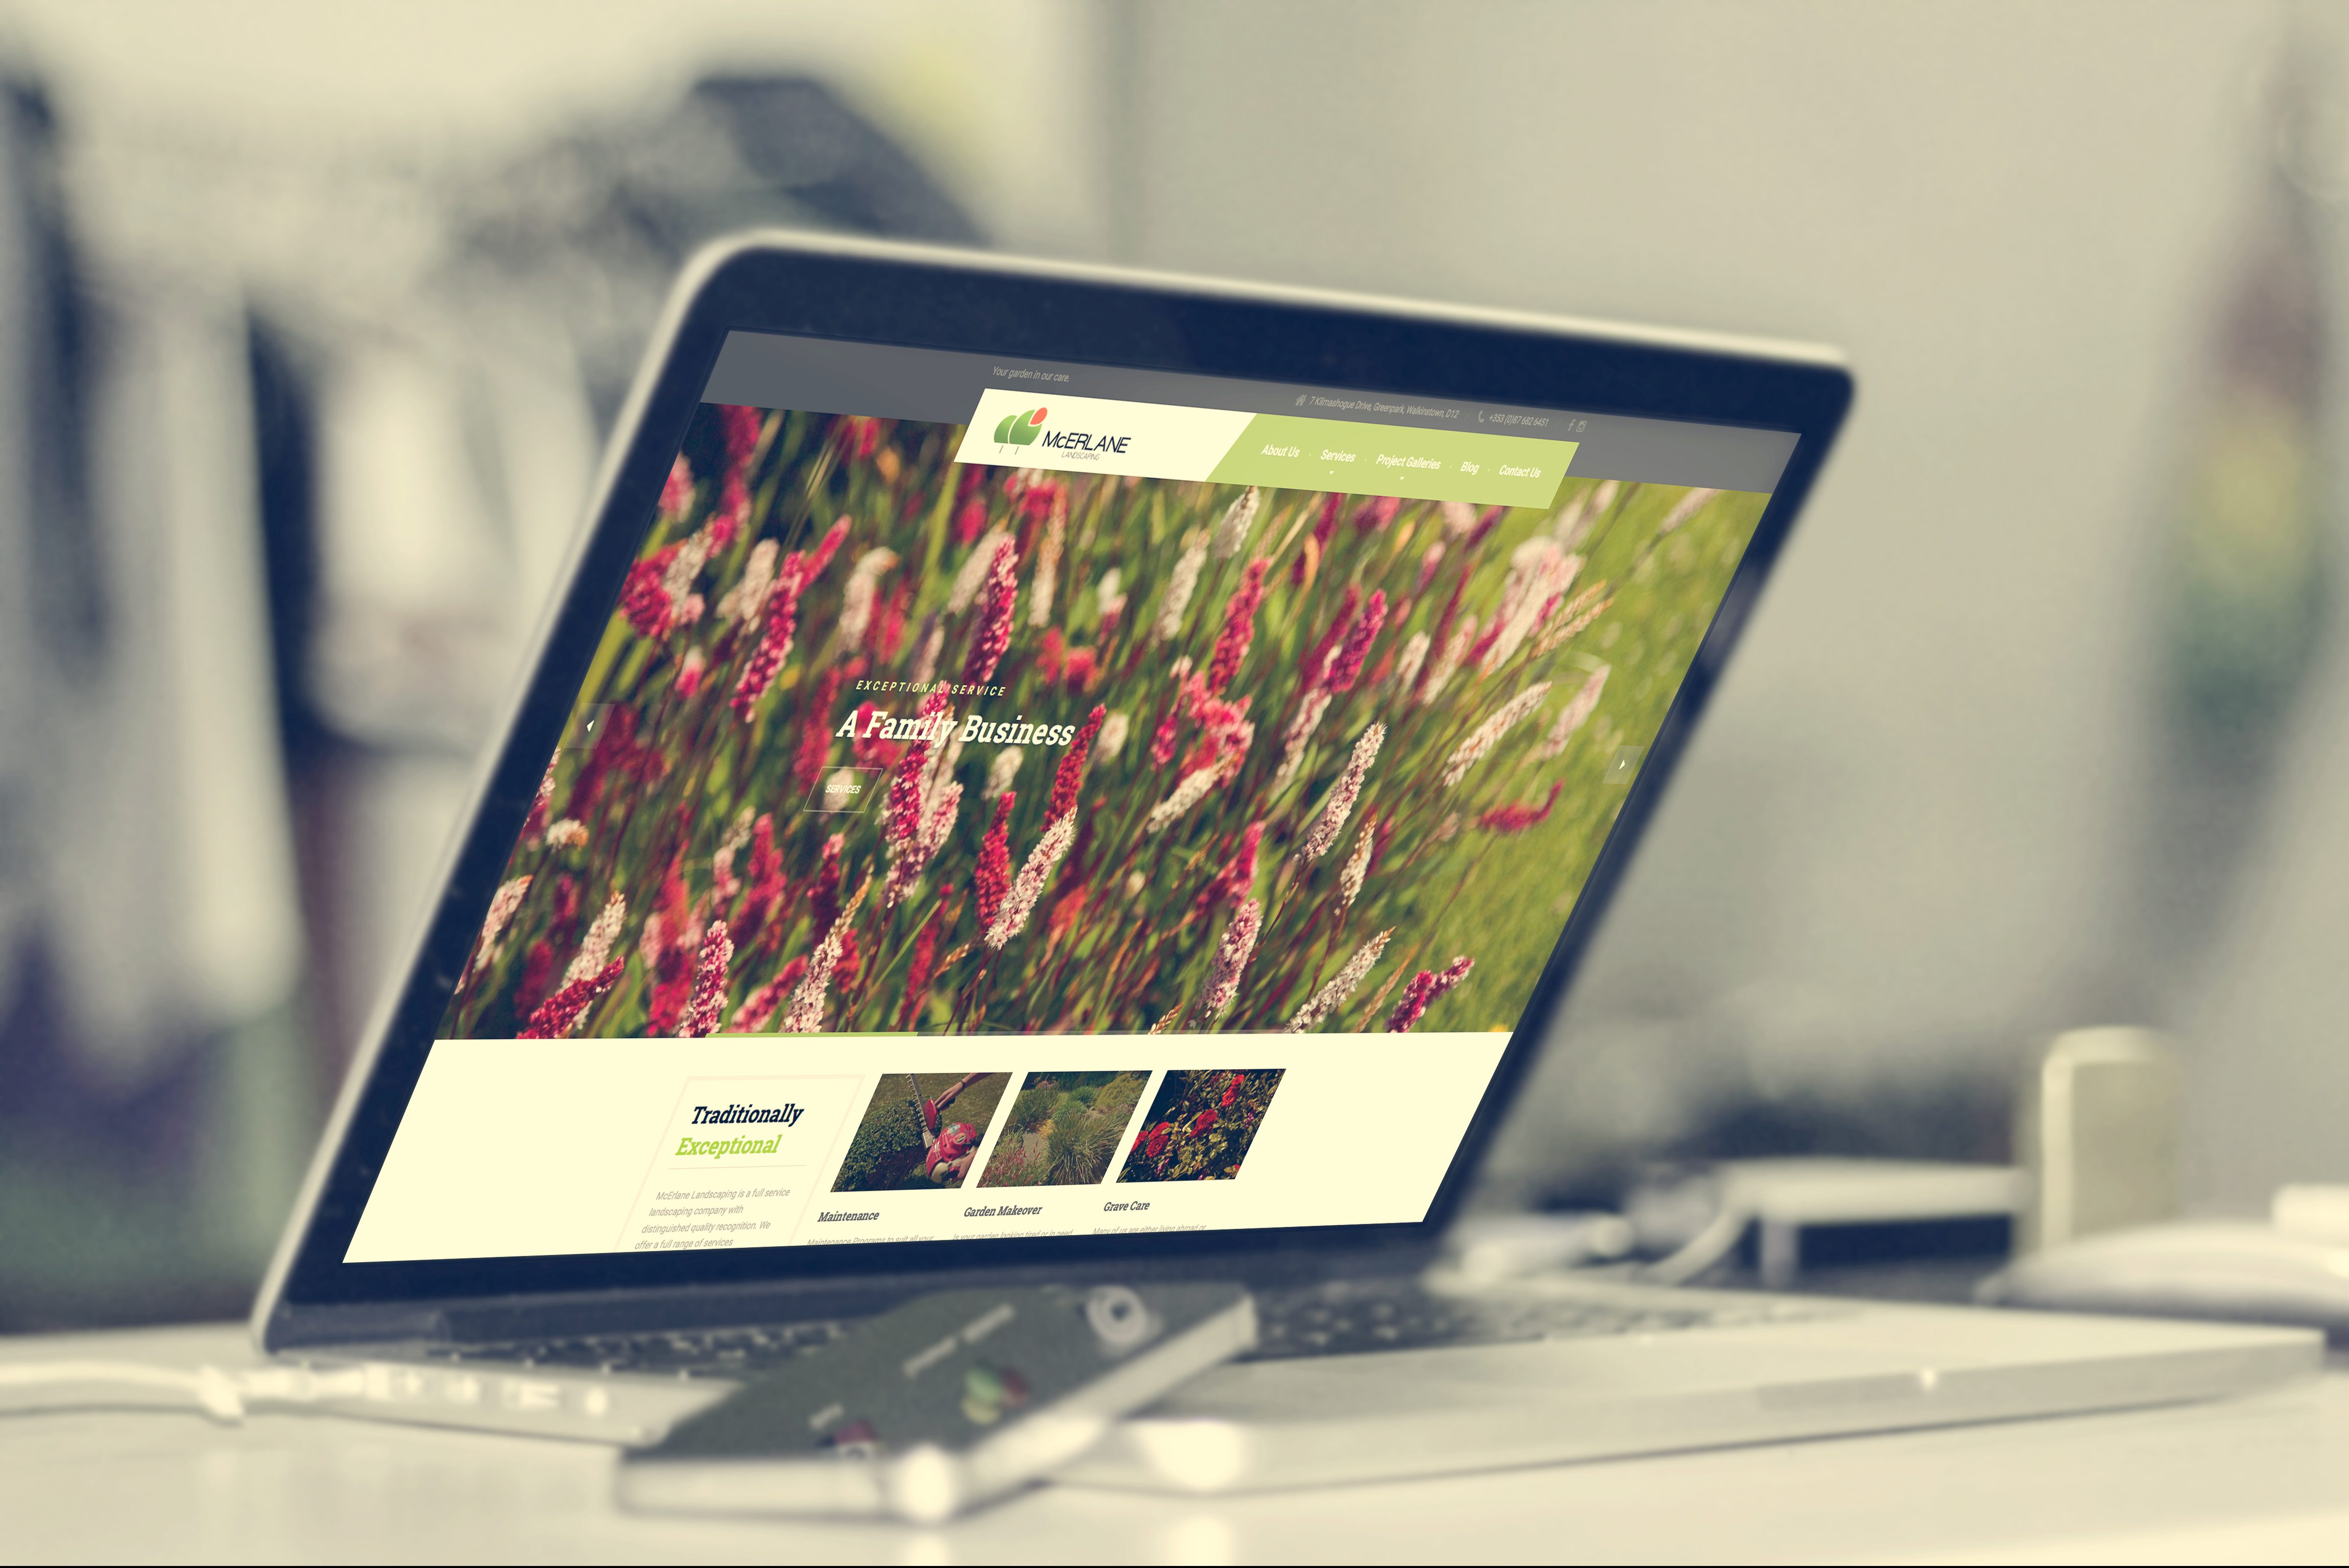 creomedia, digital agency, dublin, video, web, design, media production, digital marketing, fine art